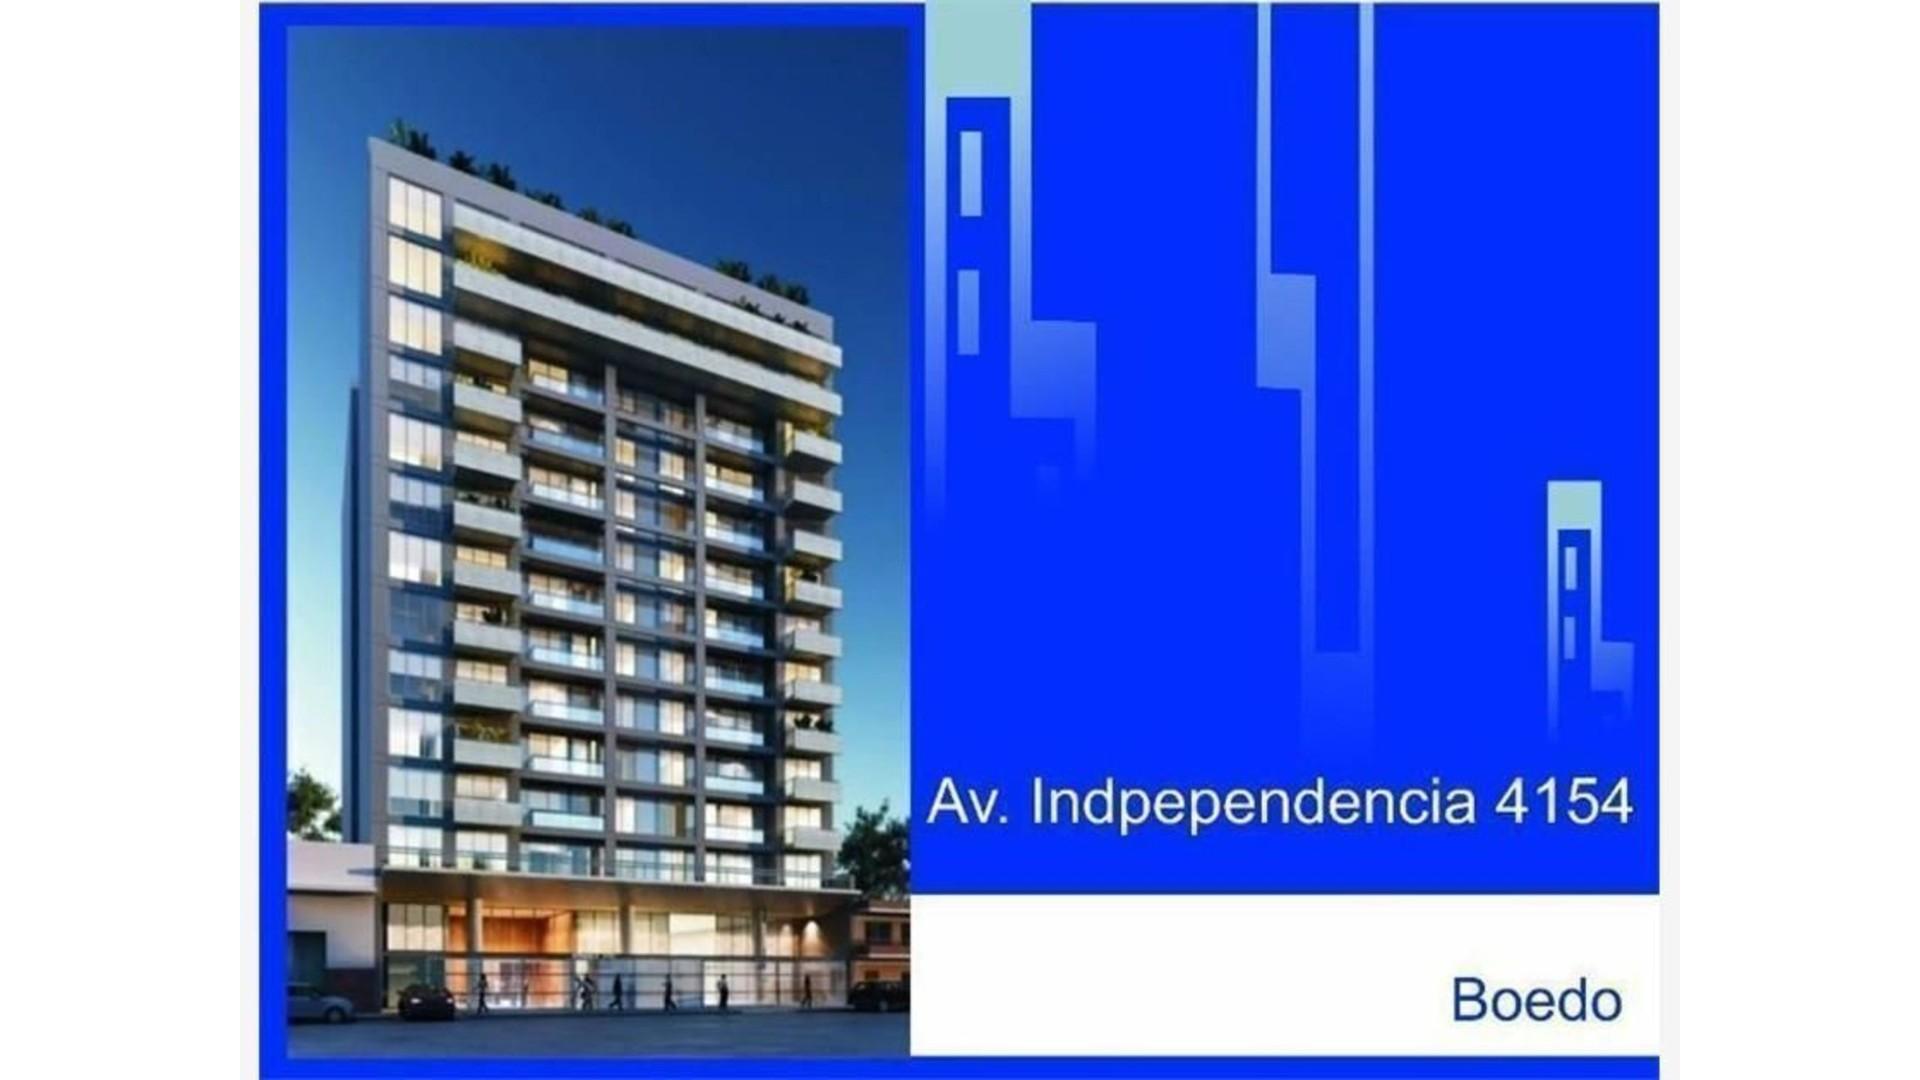 Av.Independencia 4154  12- Boedo